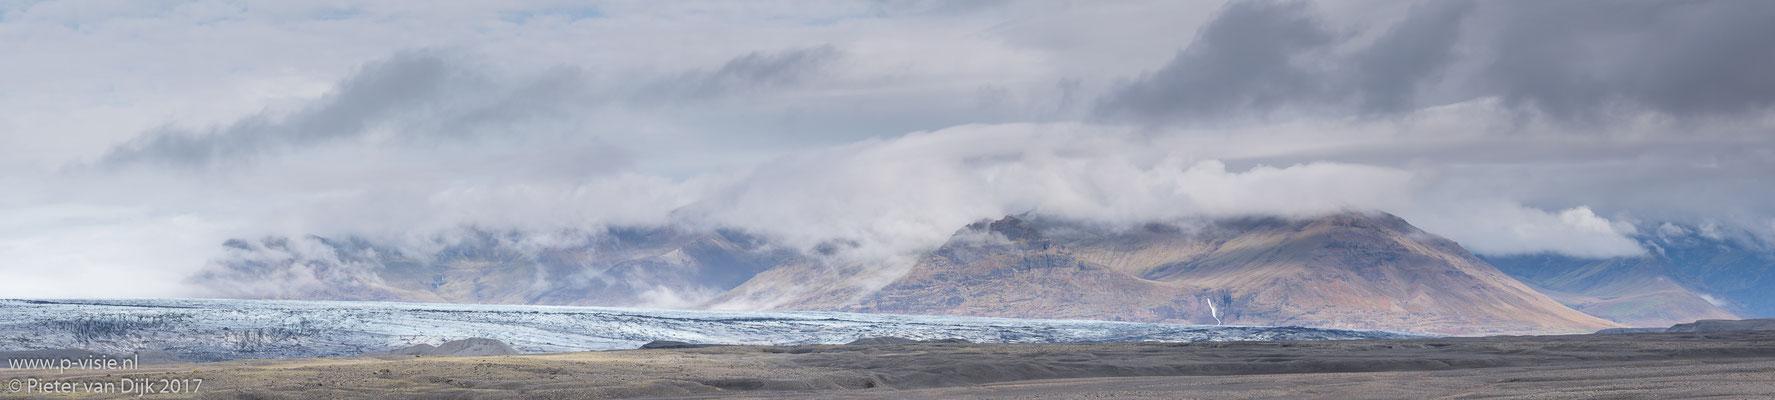 Panorama van Skaftafell